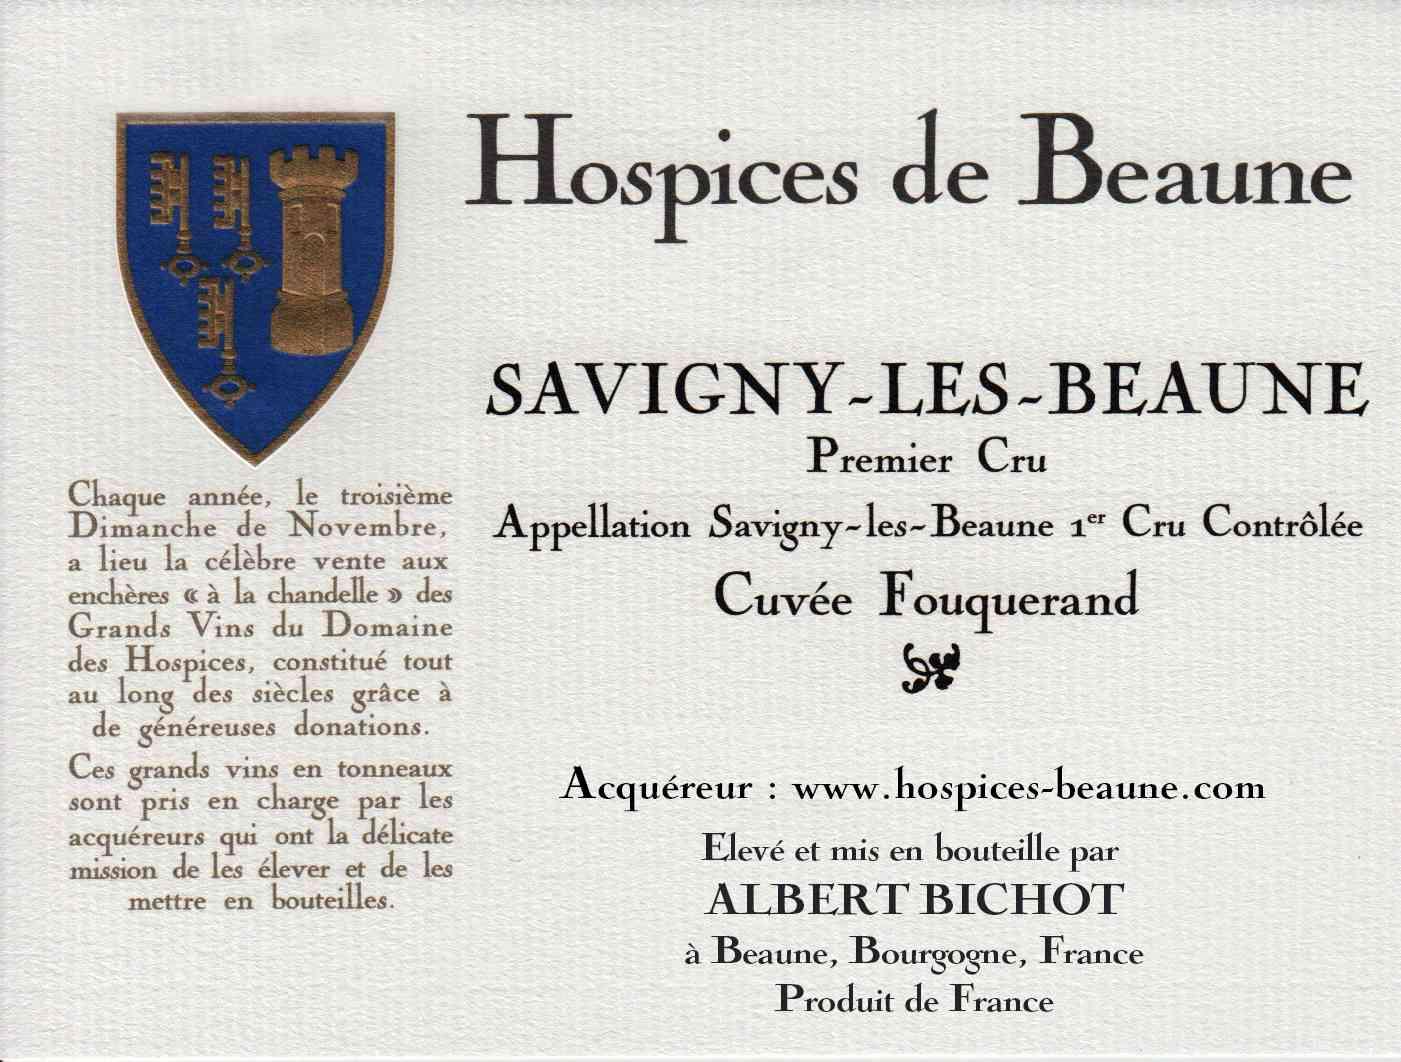 Encheres-auction-HospicesdeBeaune-AlbertBichot-SavignyLesBeaune-PremierCru-Cuvee-Fouquerand